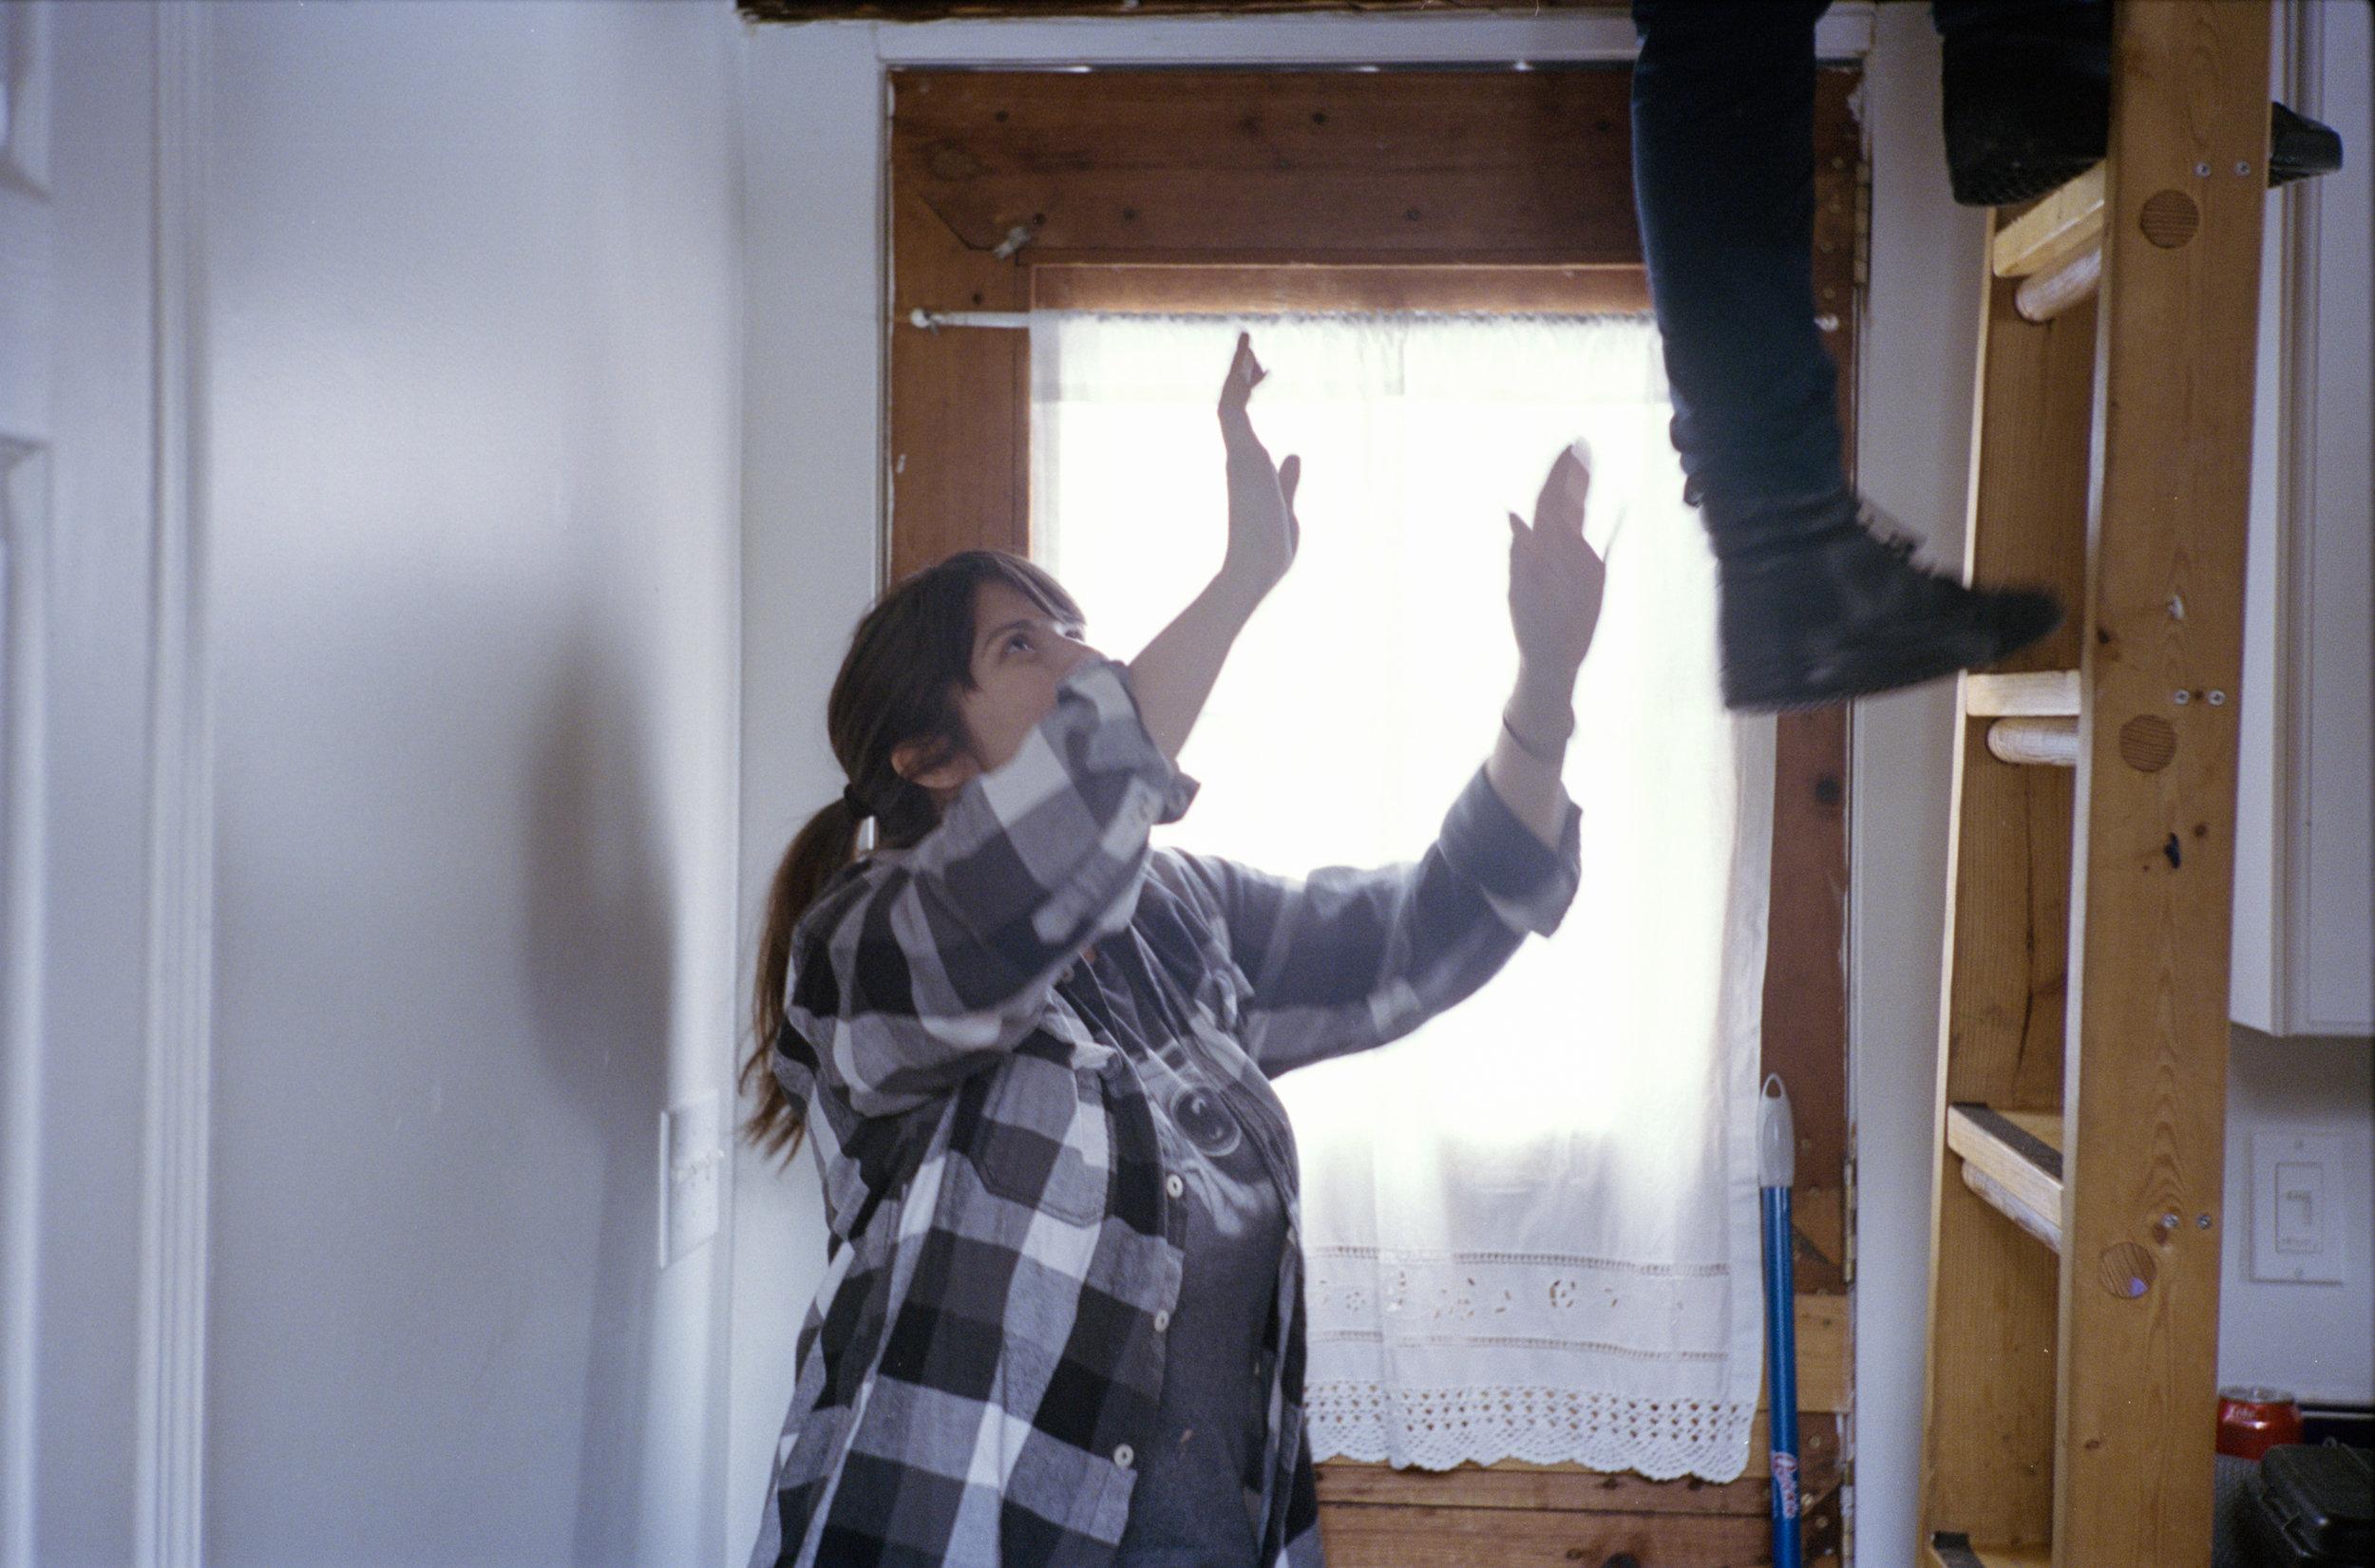 Producer Maria Altamirano spotting all ladder-climbers  Kodak Portra (35mm)